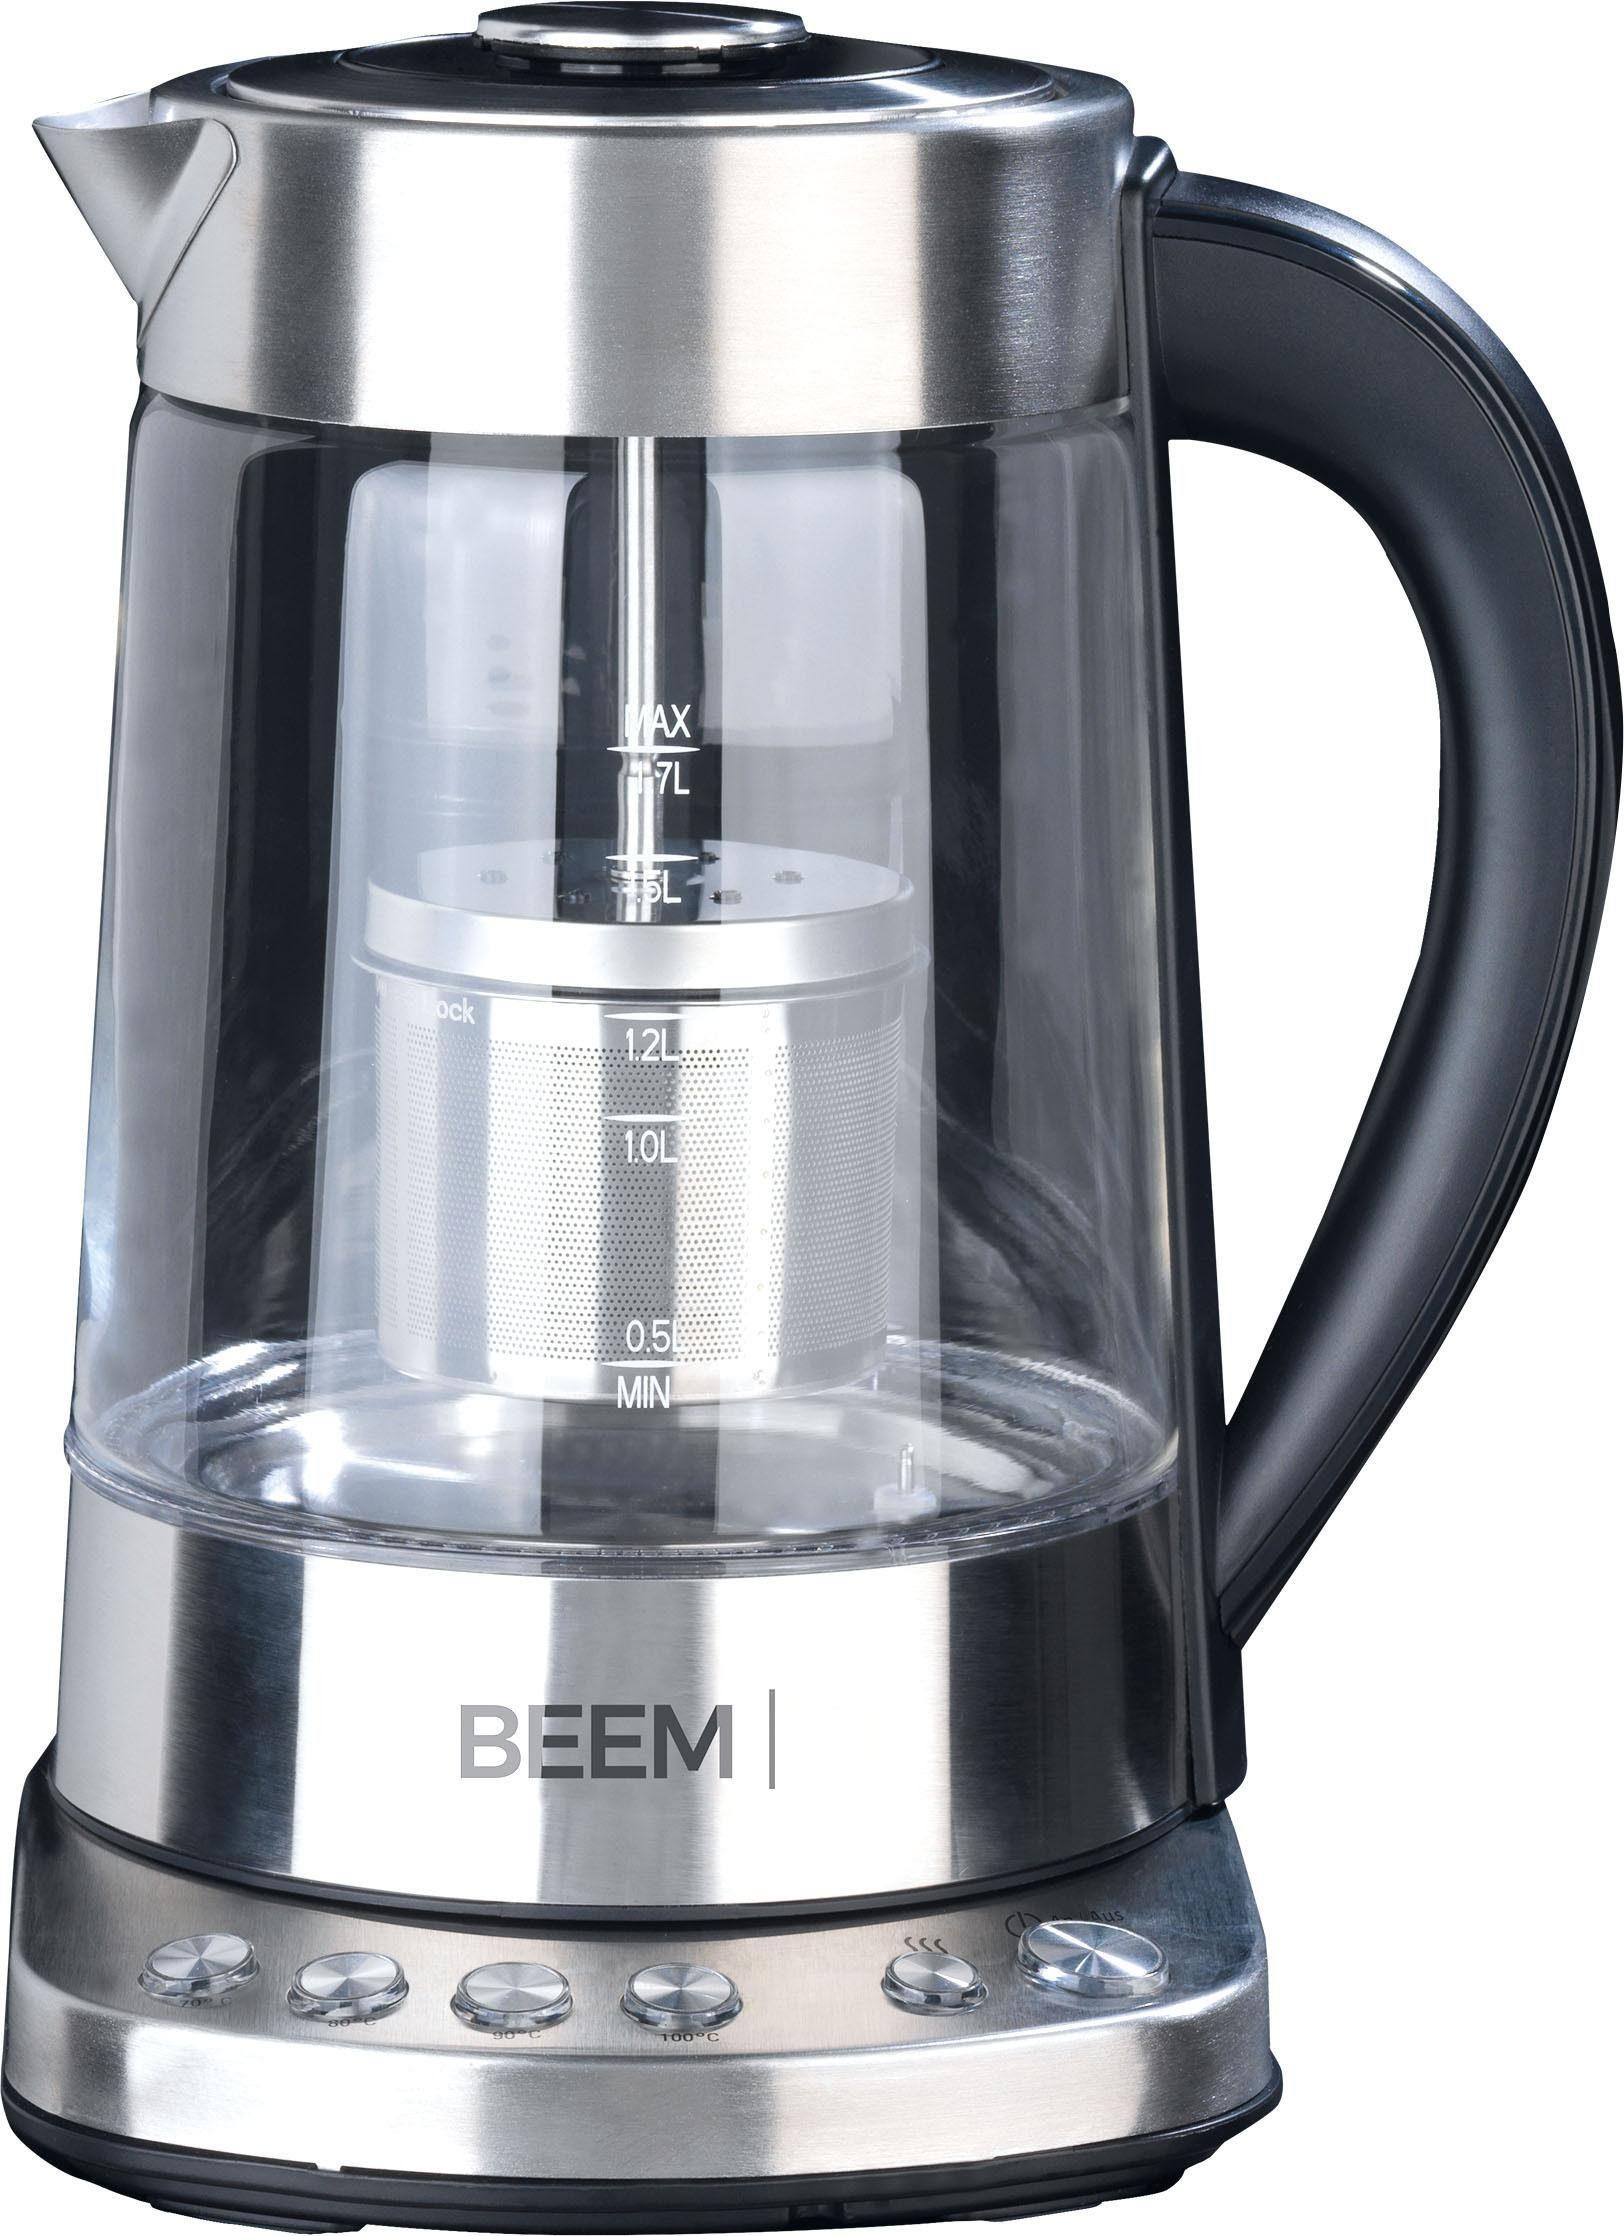 Beem Wasserkocher Teatime, 1,7 Liter, 2000 Watt